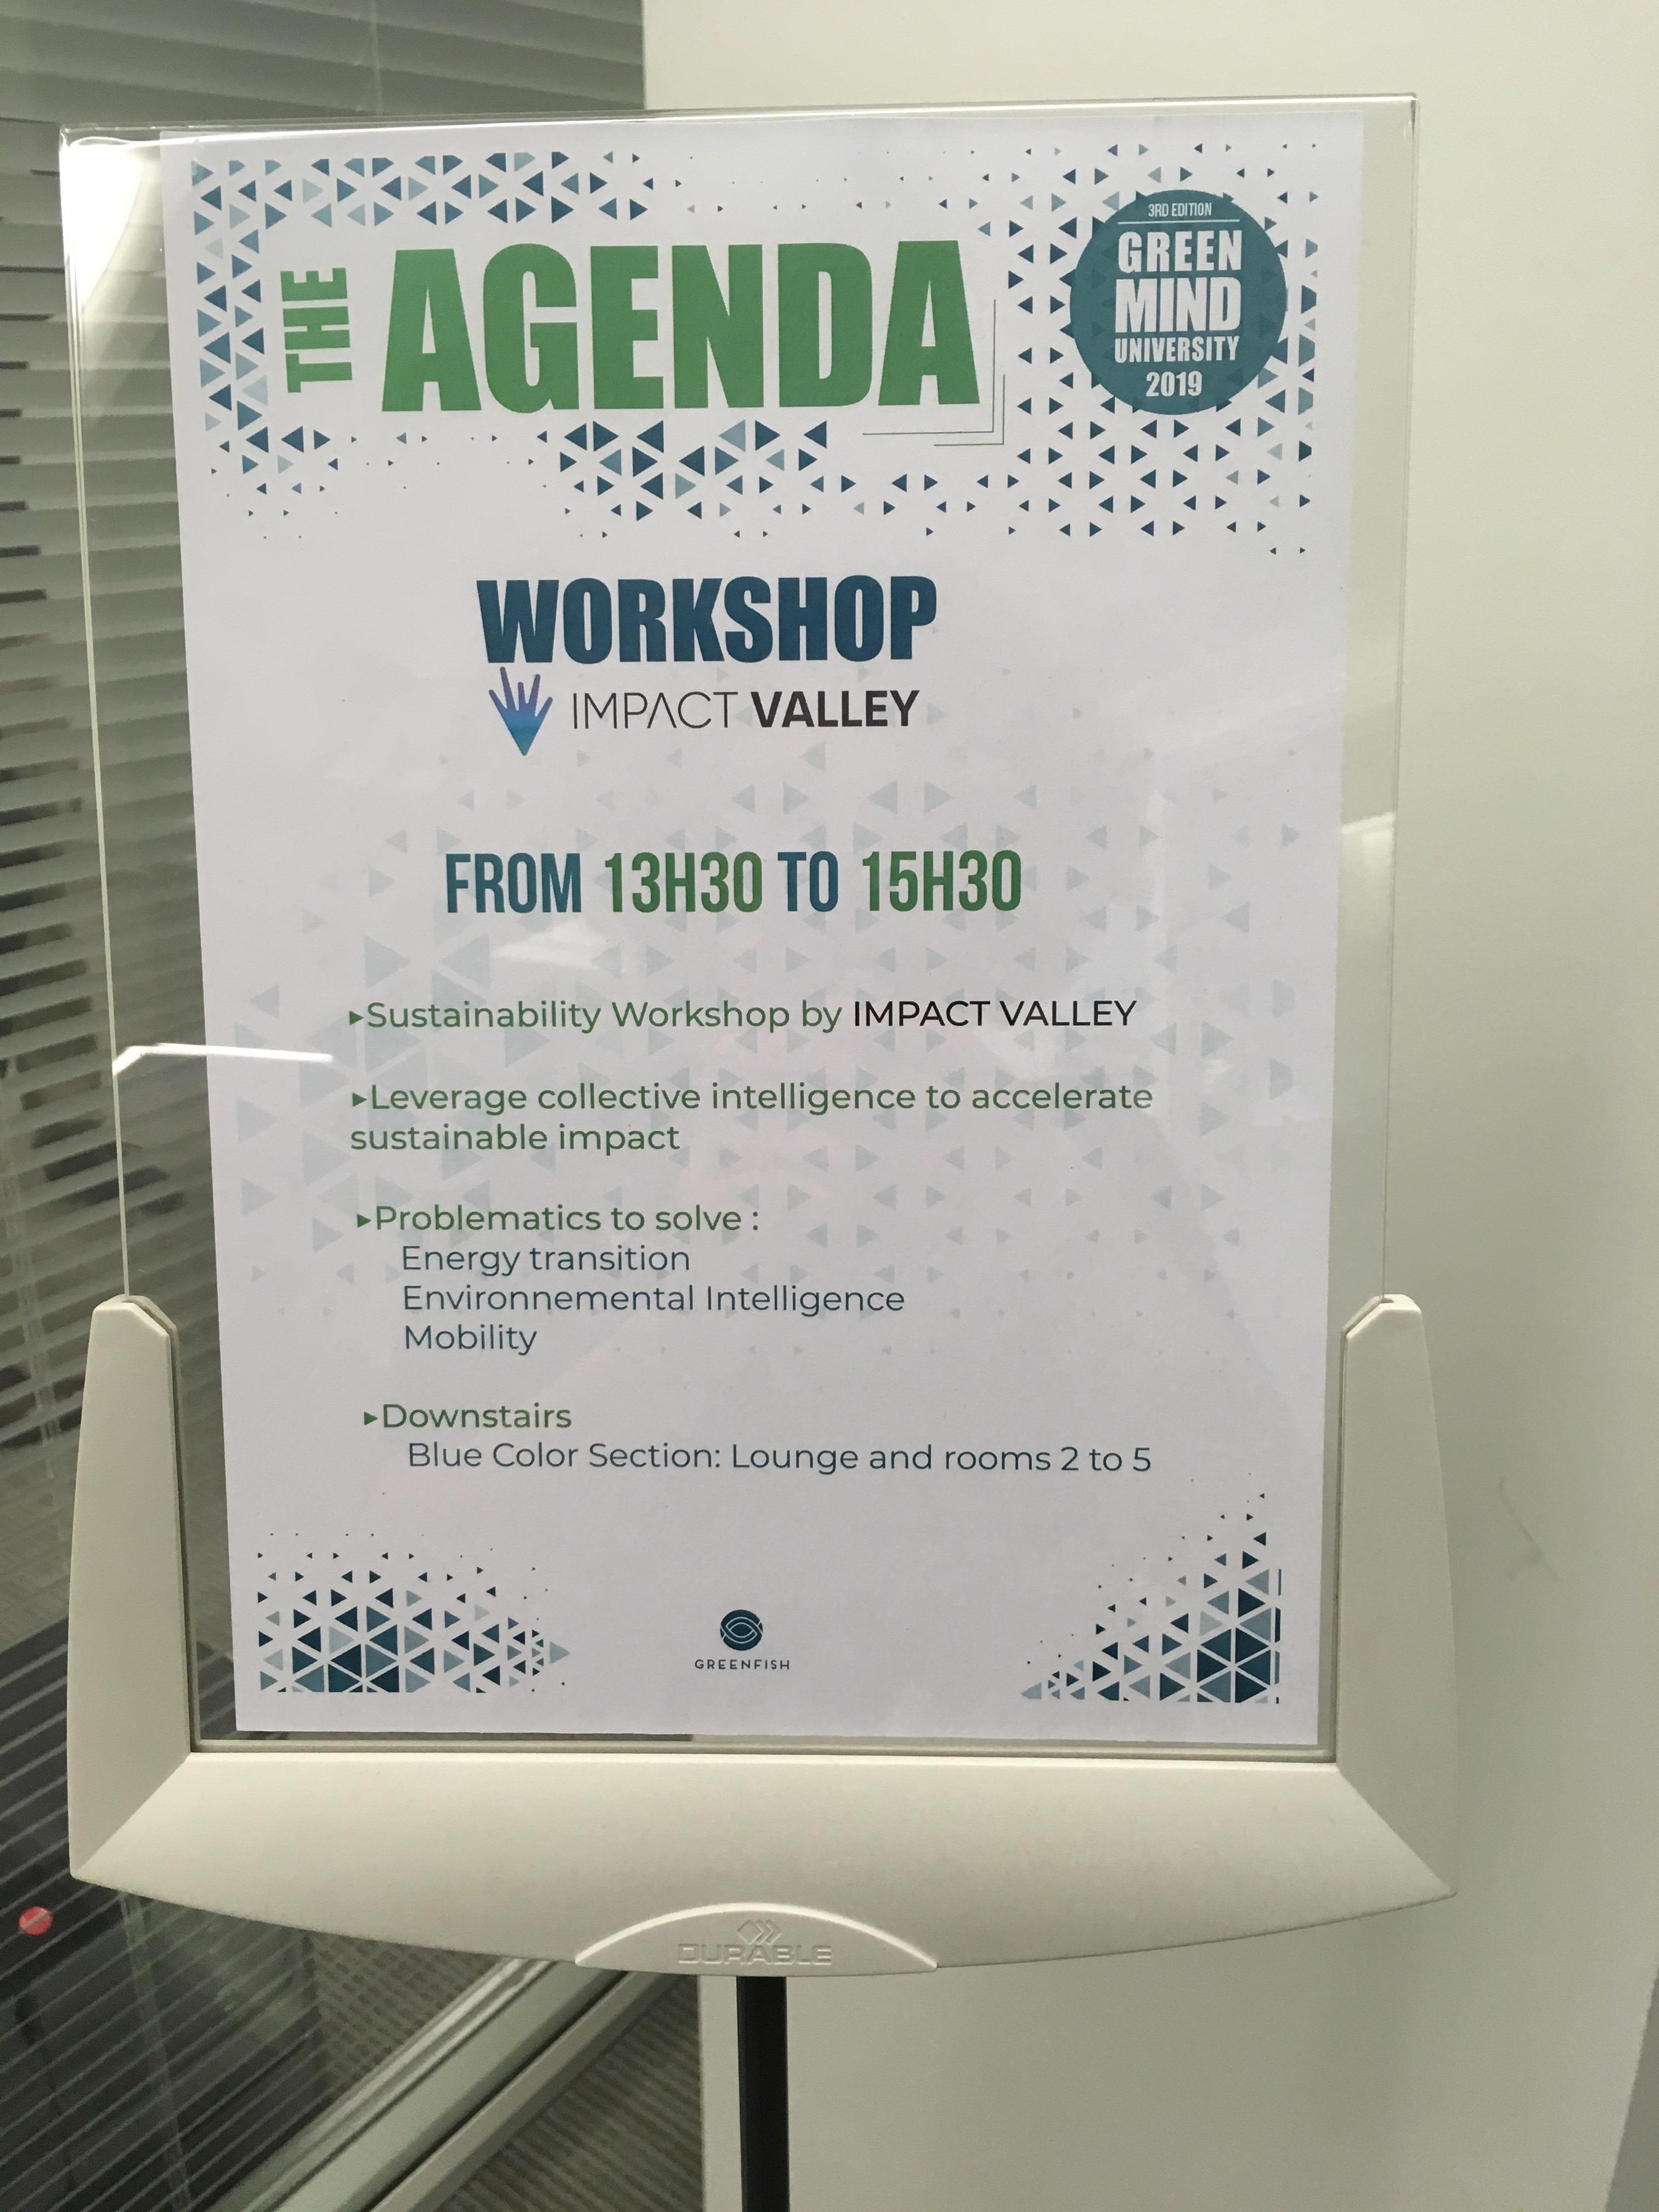 Agenda workshop greenfish